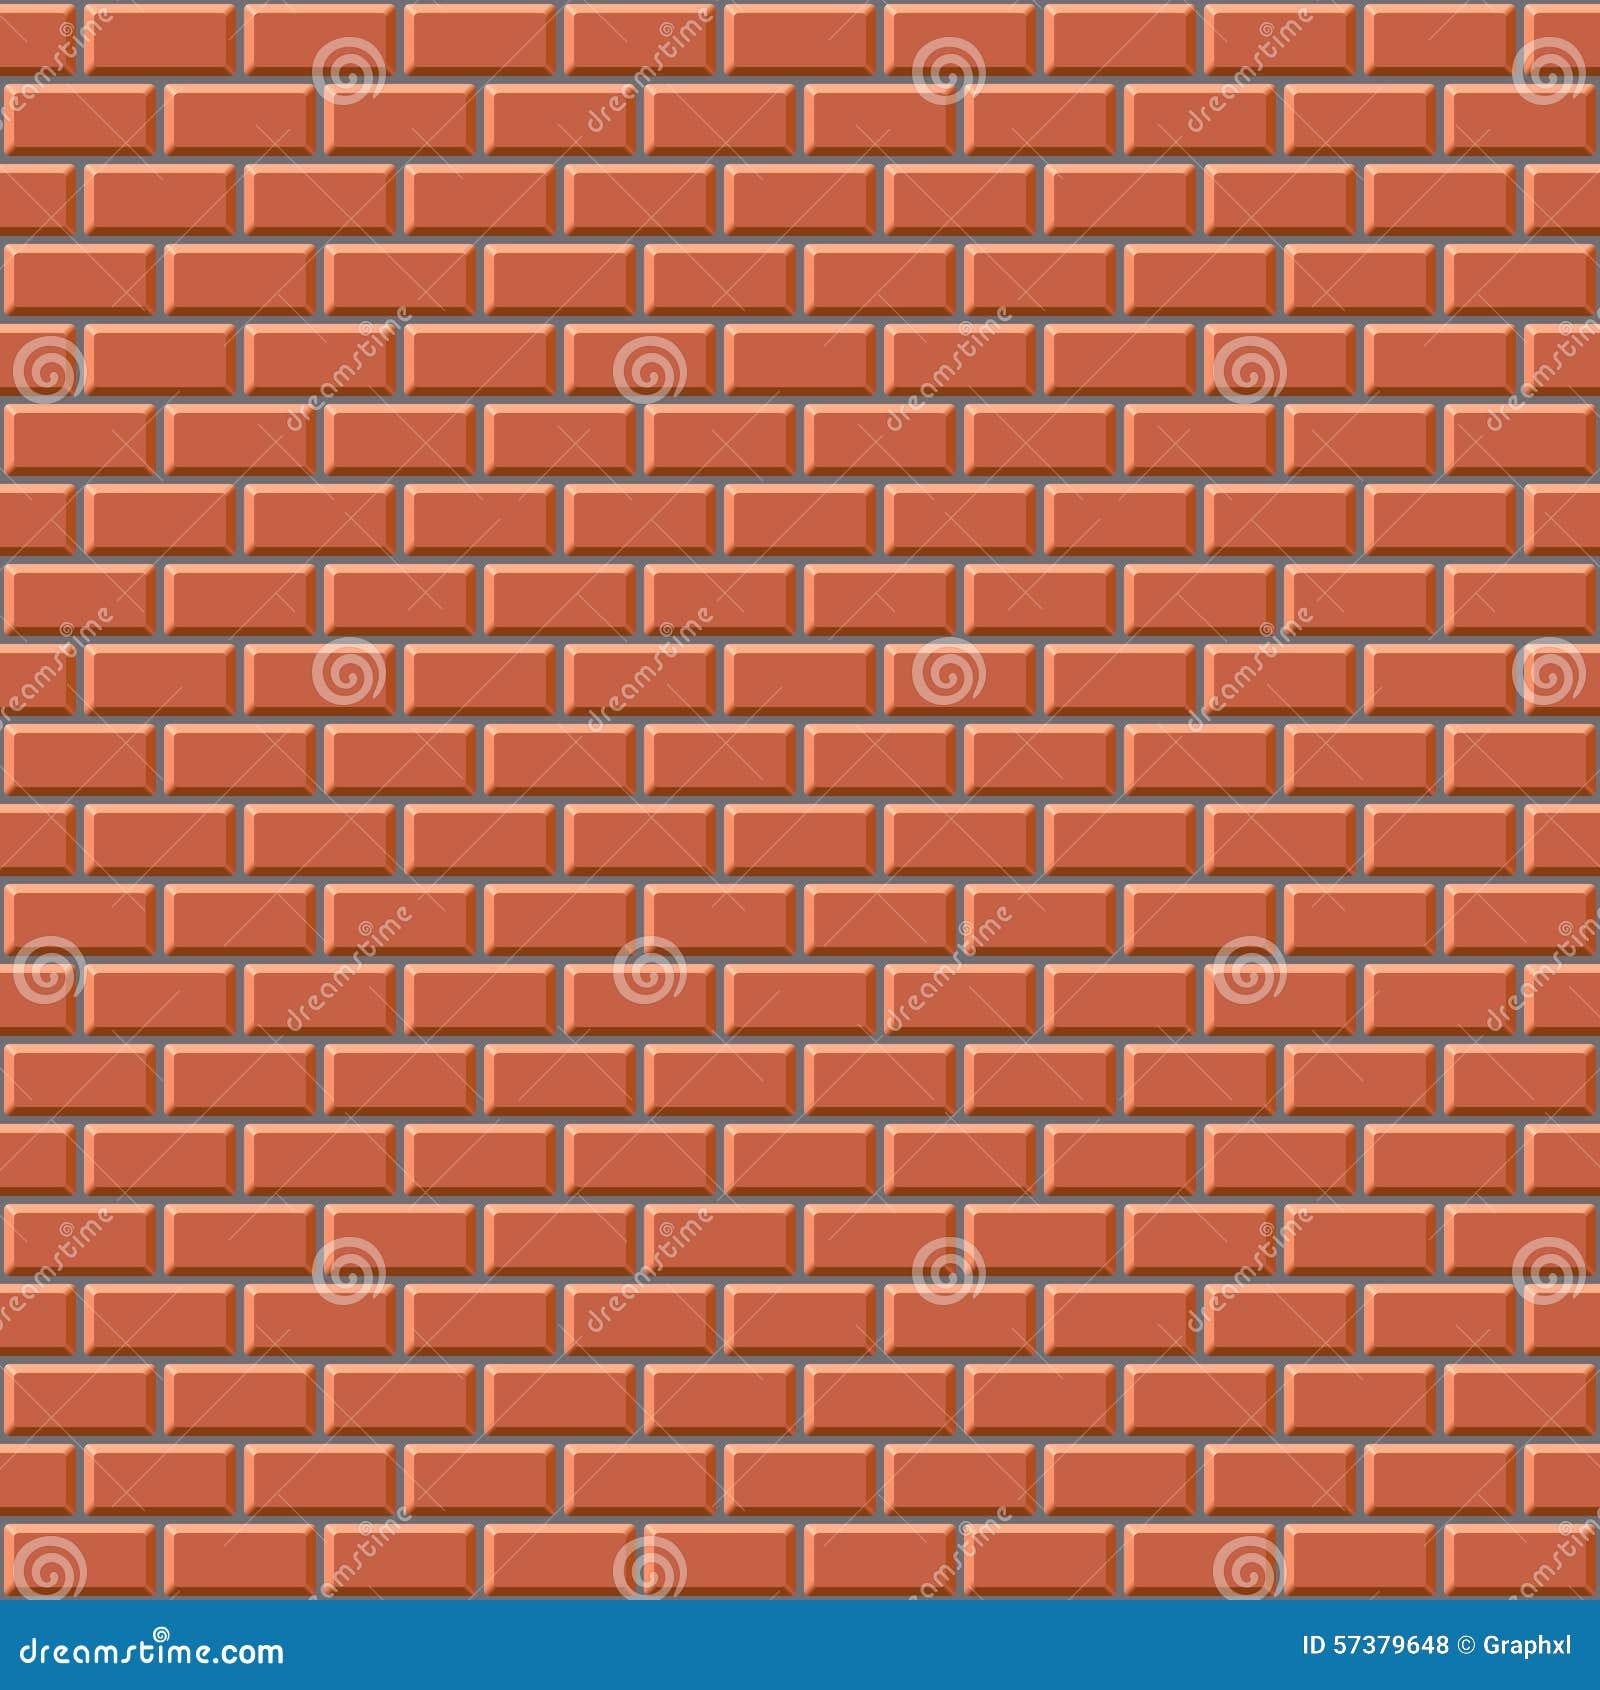 Seamless 3D brick wall texture